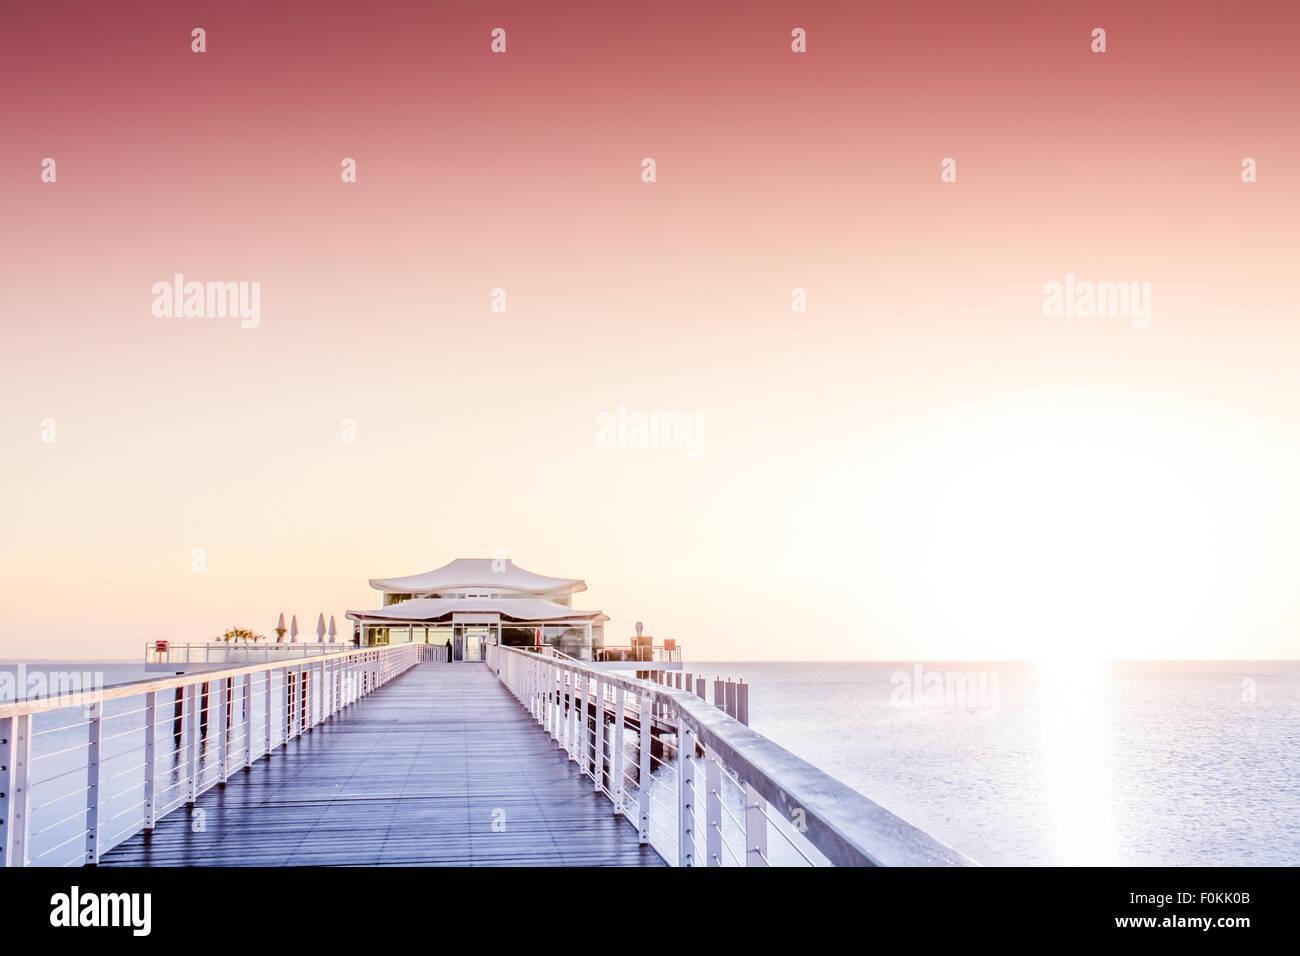 Germany, Niendorf, sea bridge with tea house at sunrise Stock Photo